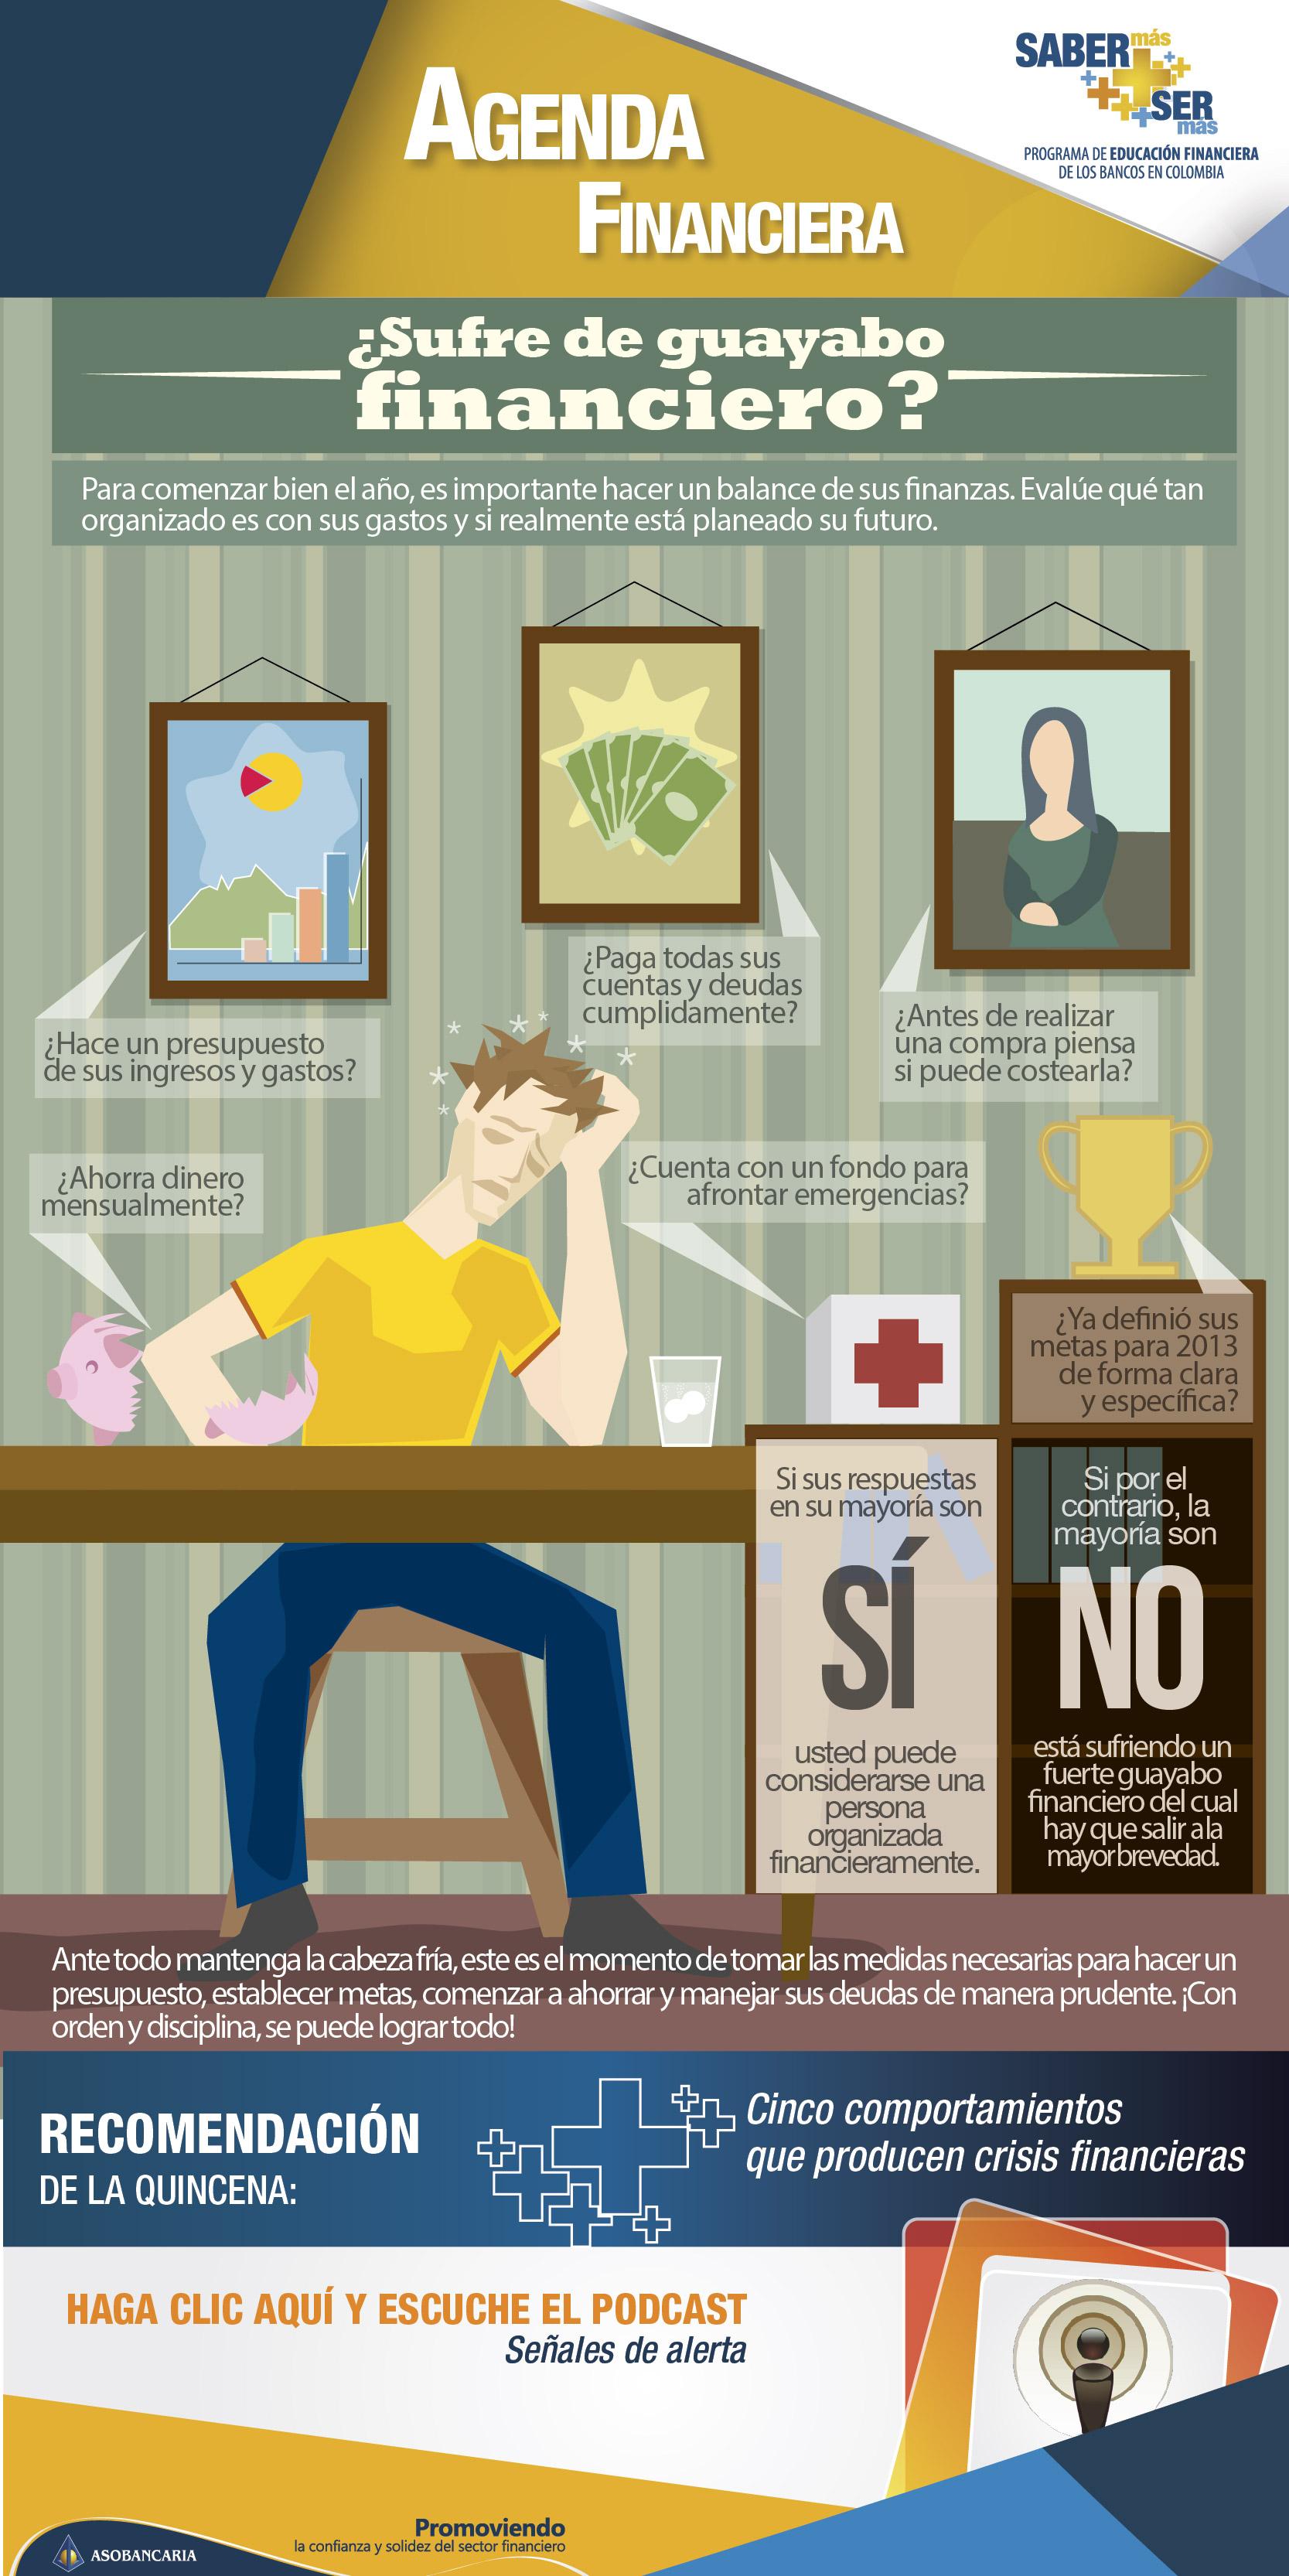 Boletin 45 - Sufre de guayabo financiero